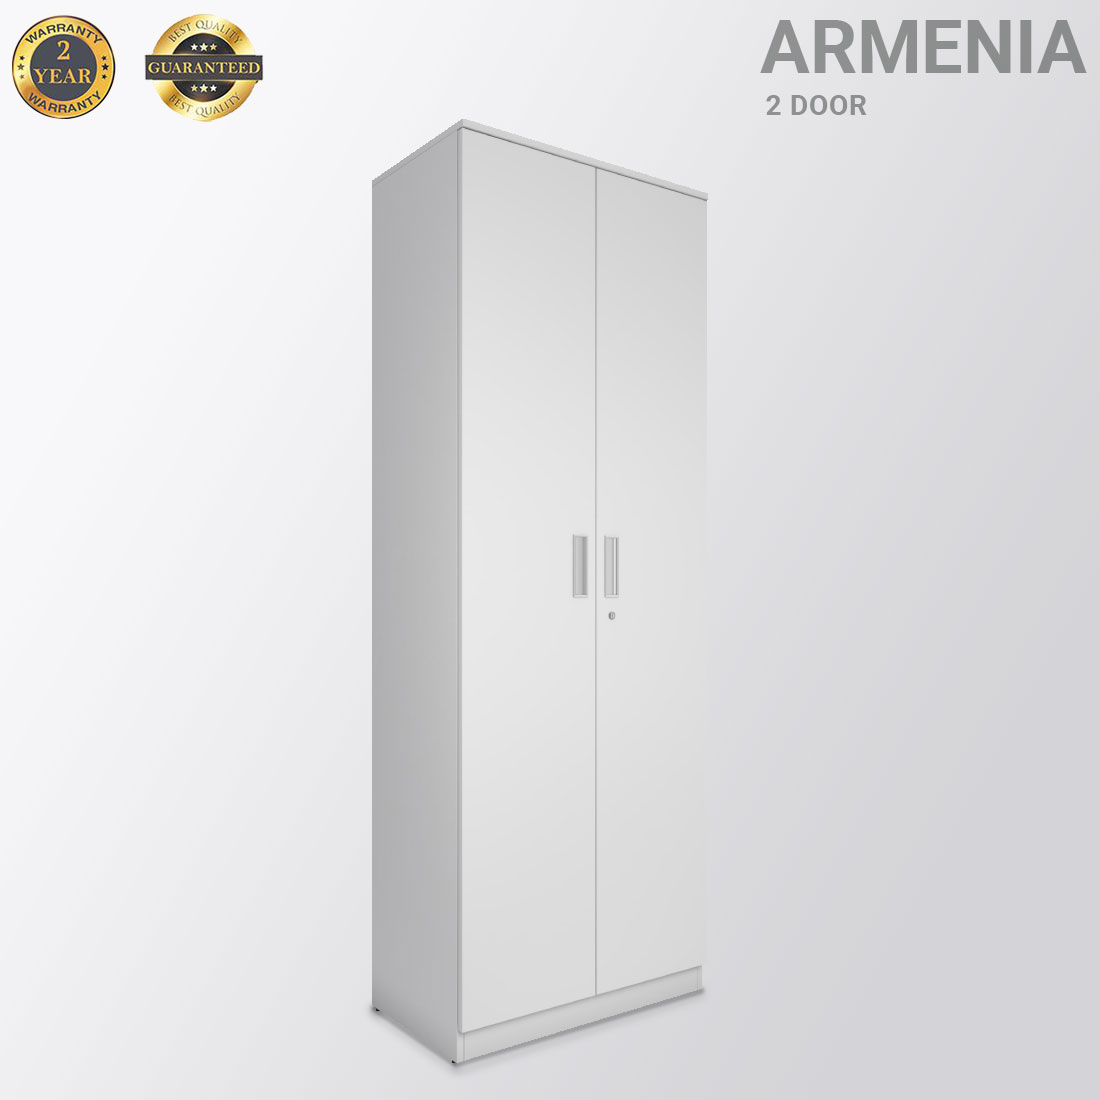 Armenia white  2 door